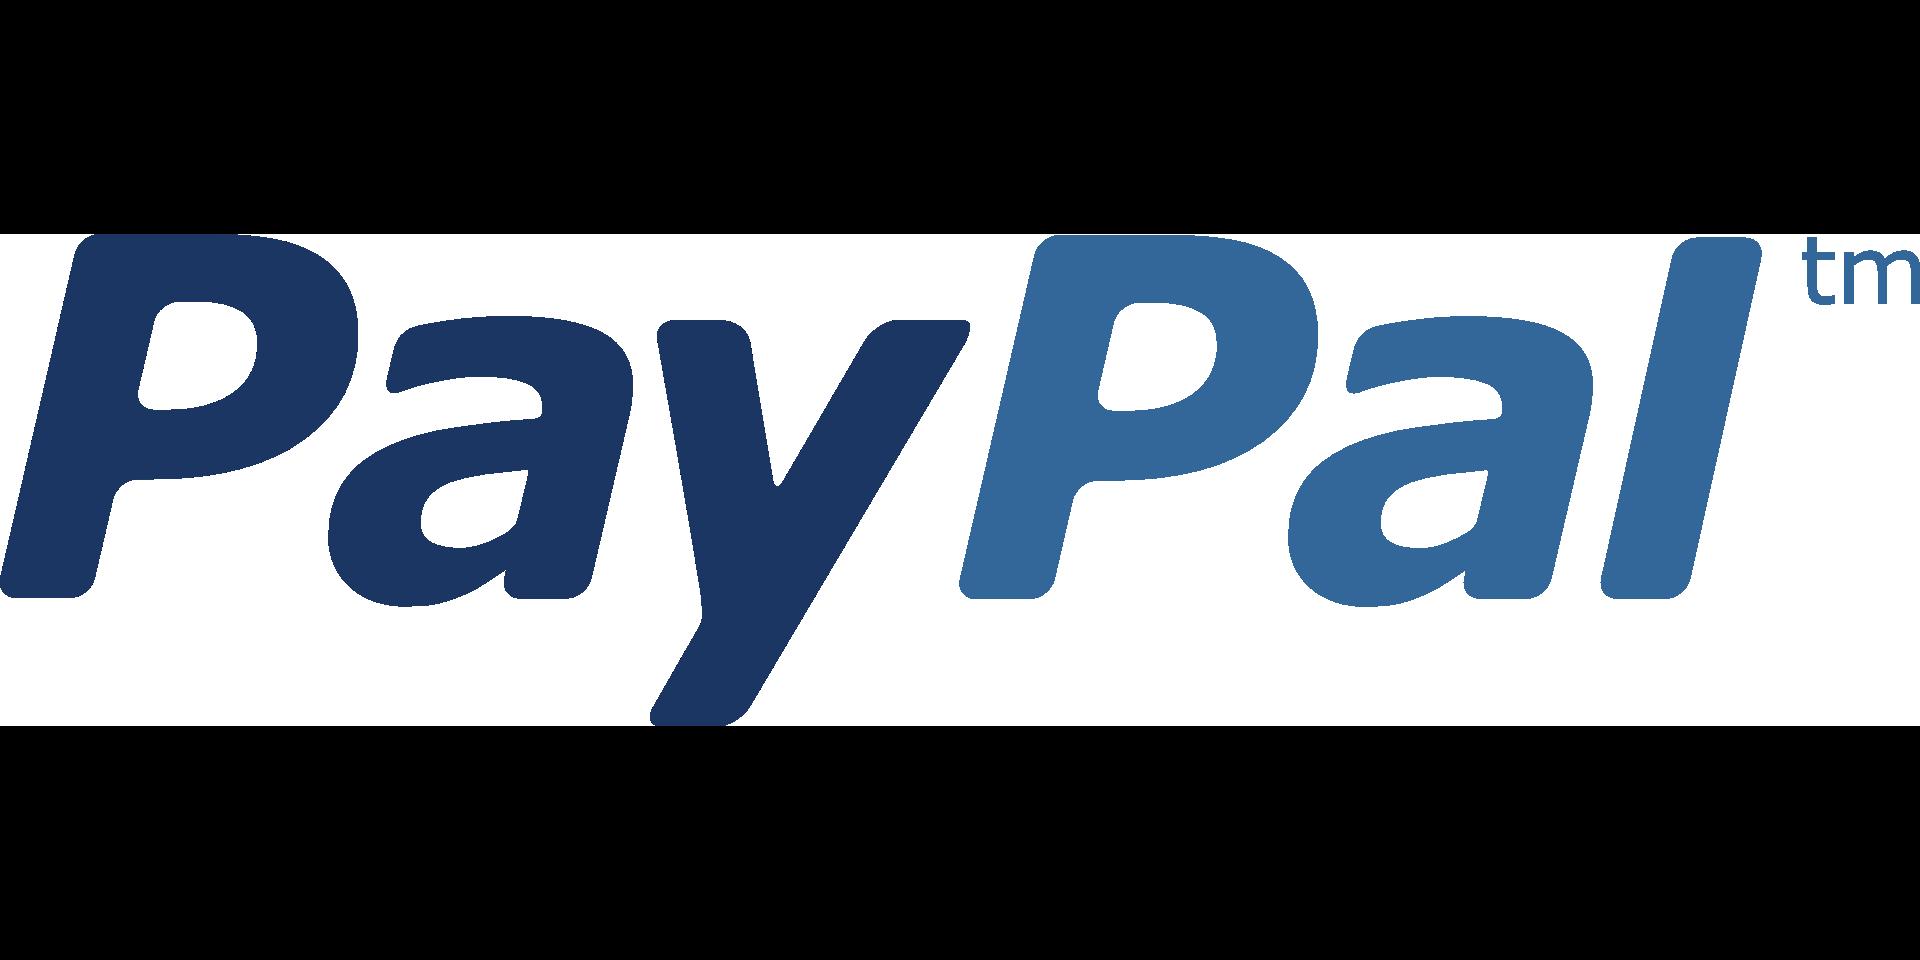 Stellar Lumens ve Cardano  PayPal'a eklenebilir